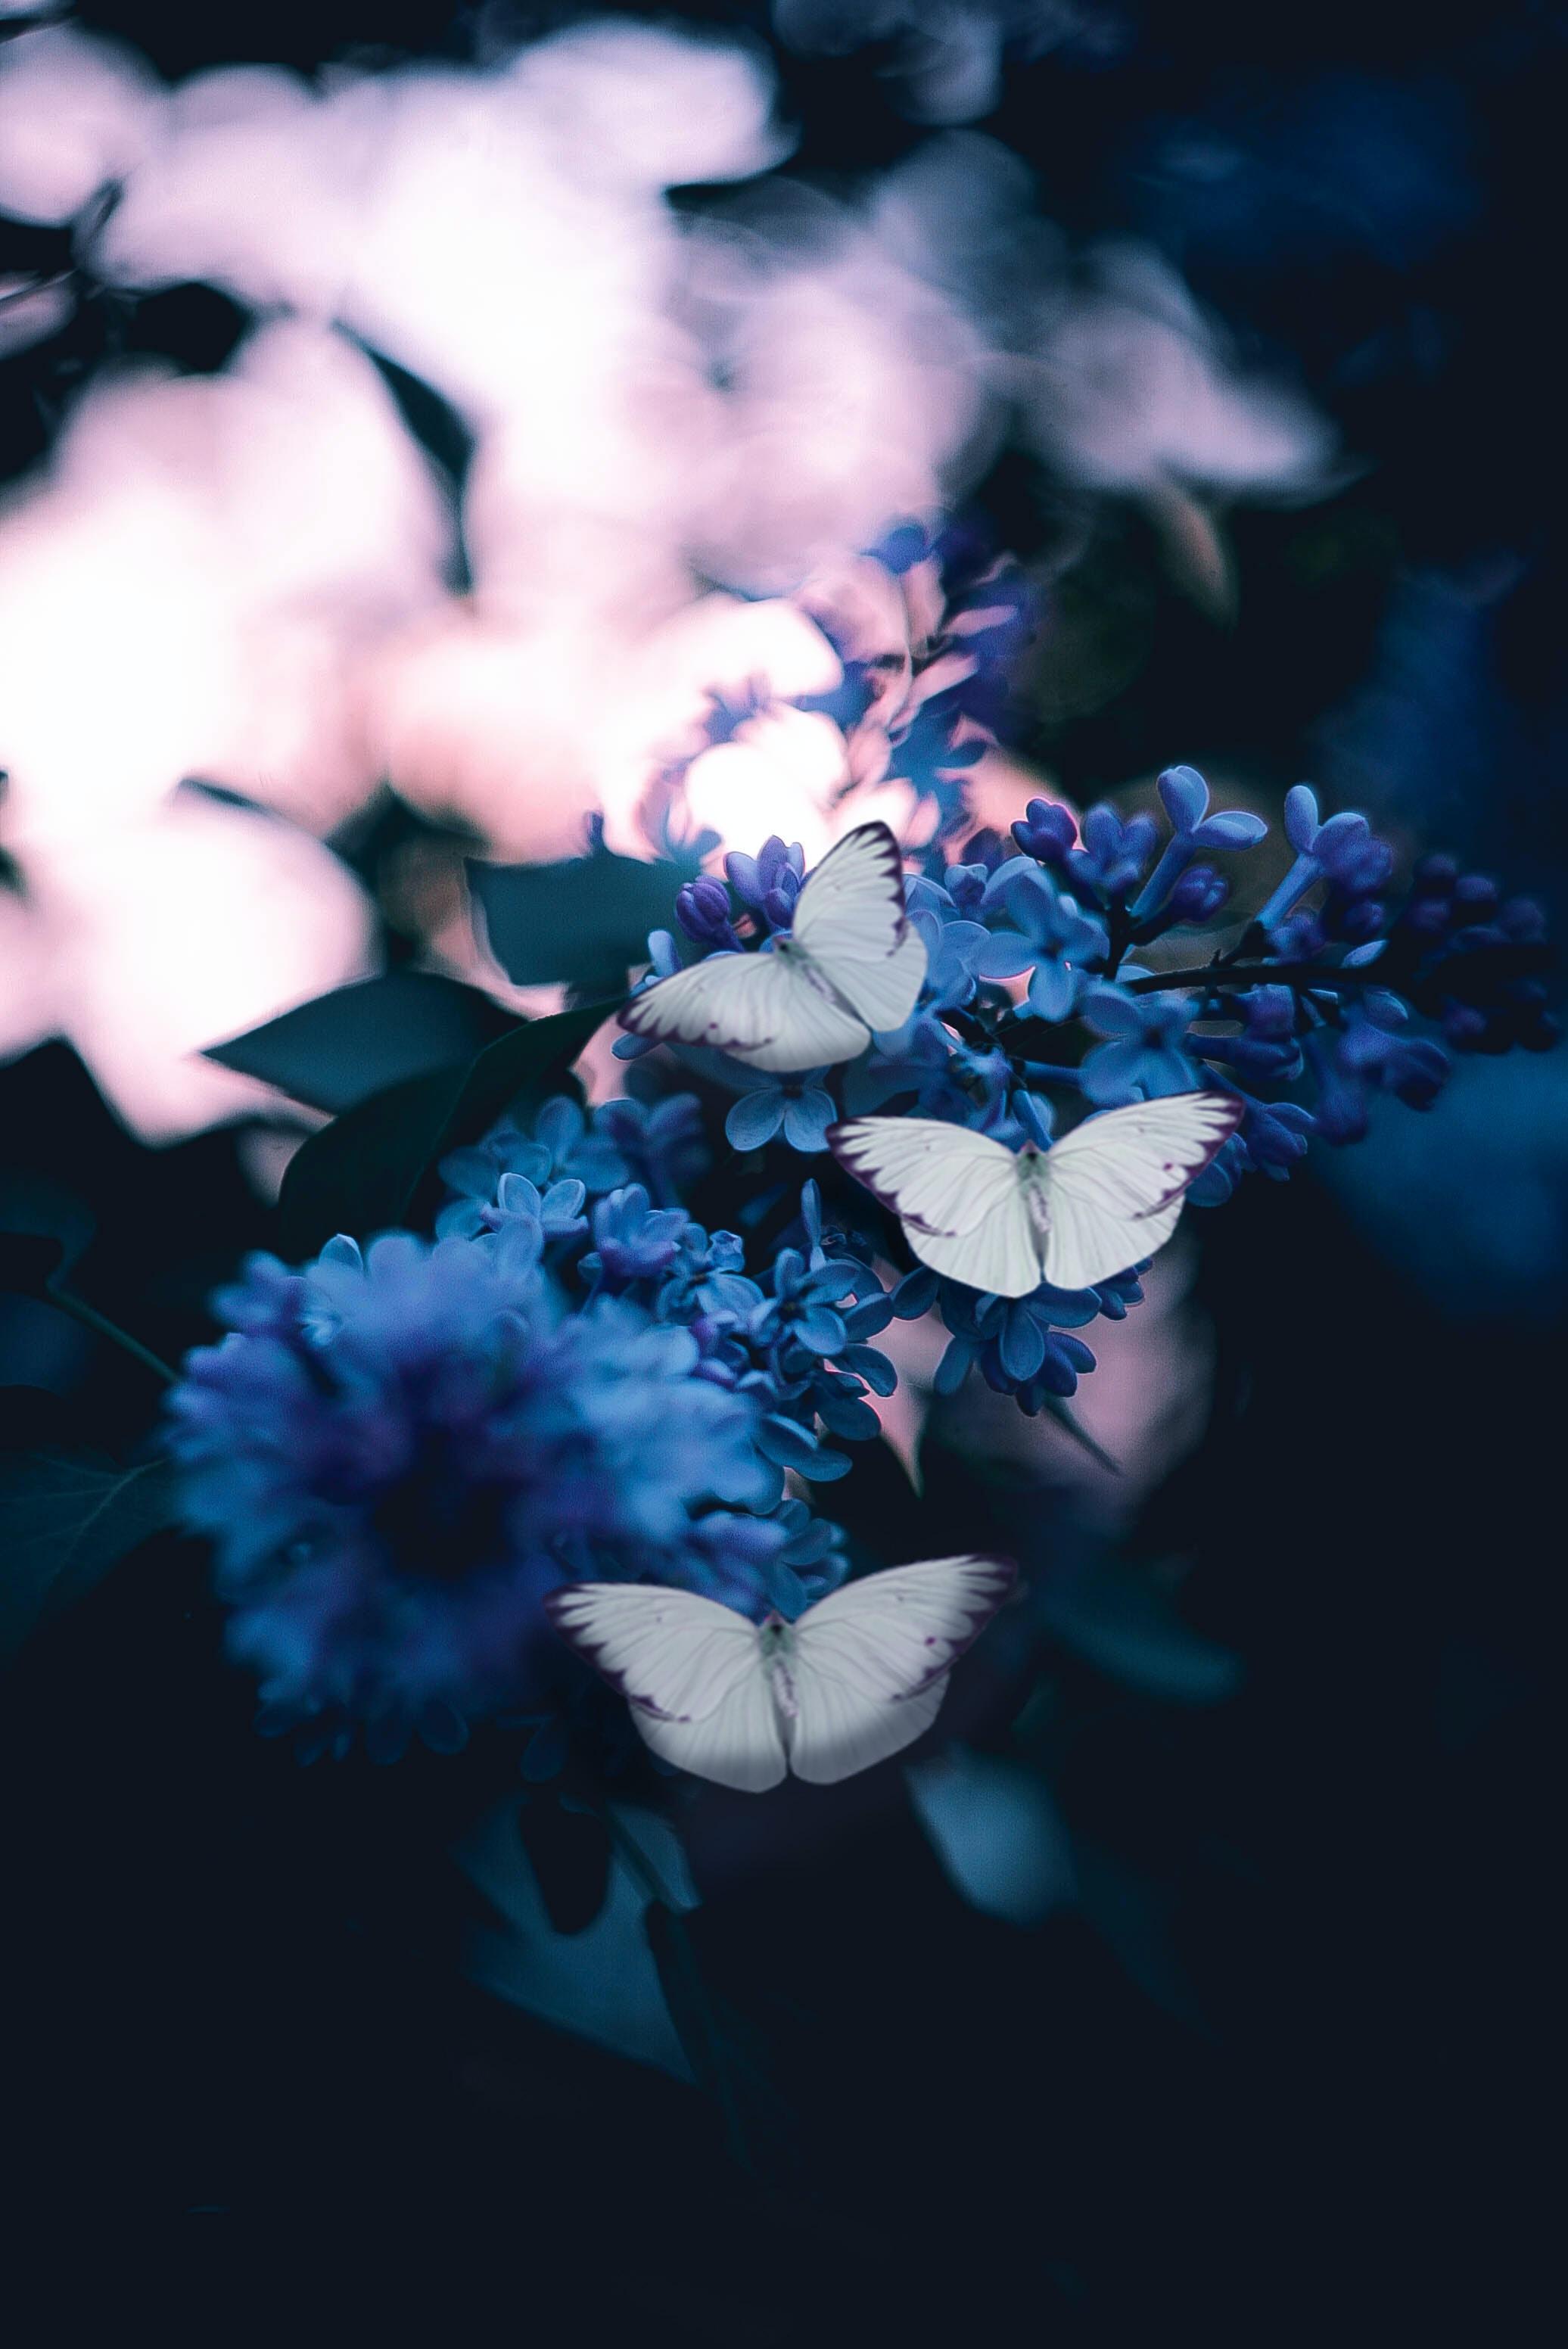 Strange Butterfly Creatures garden stories